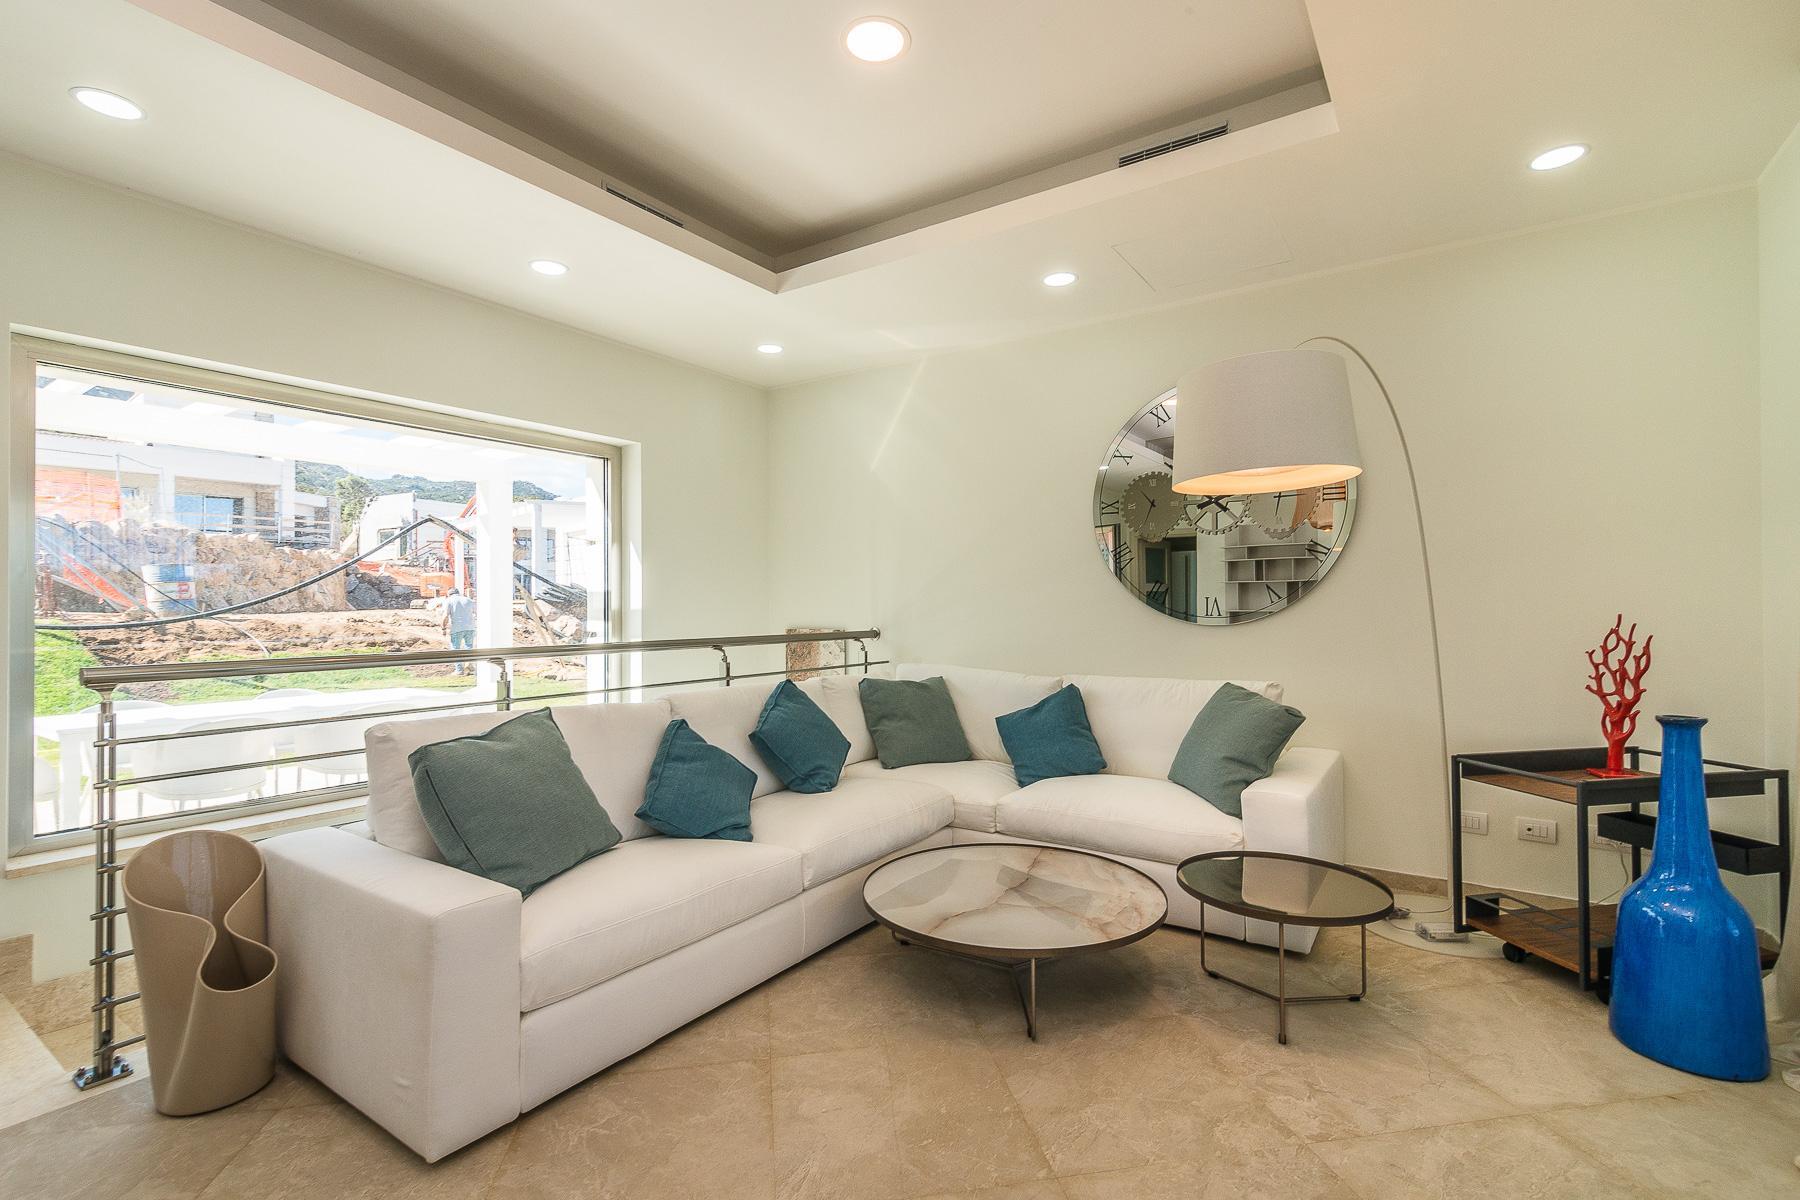 Pegasus Gorgeus Villa with swimming pool immersed in mediterranean fragrances - 4